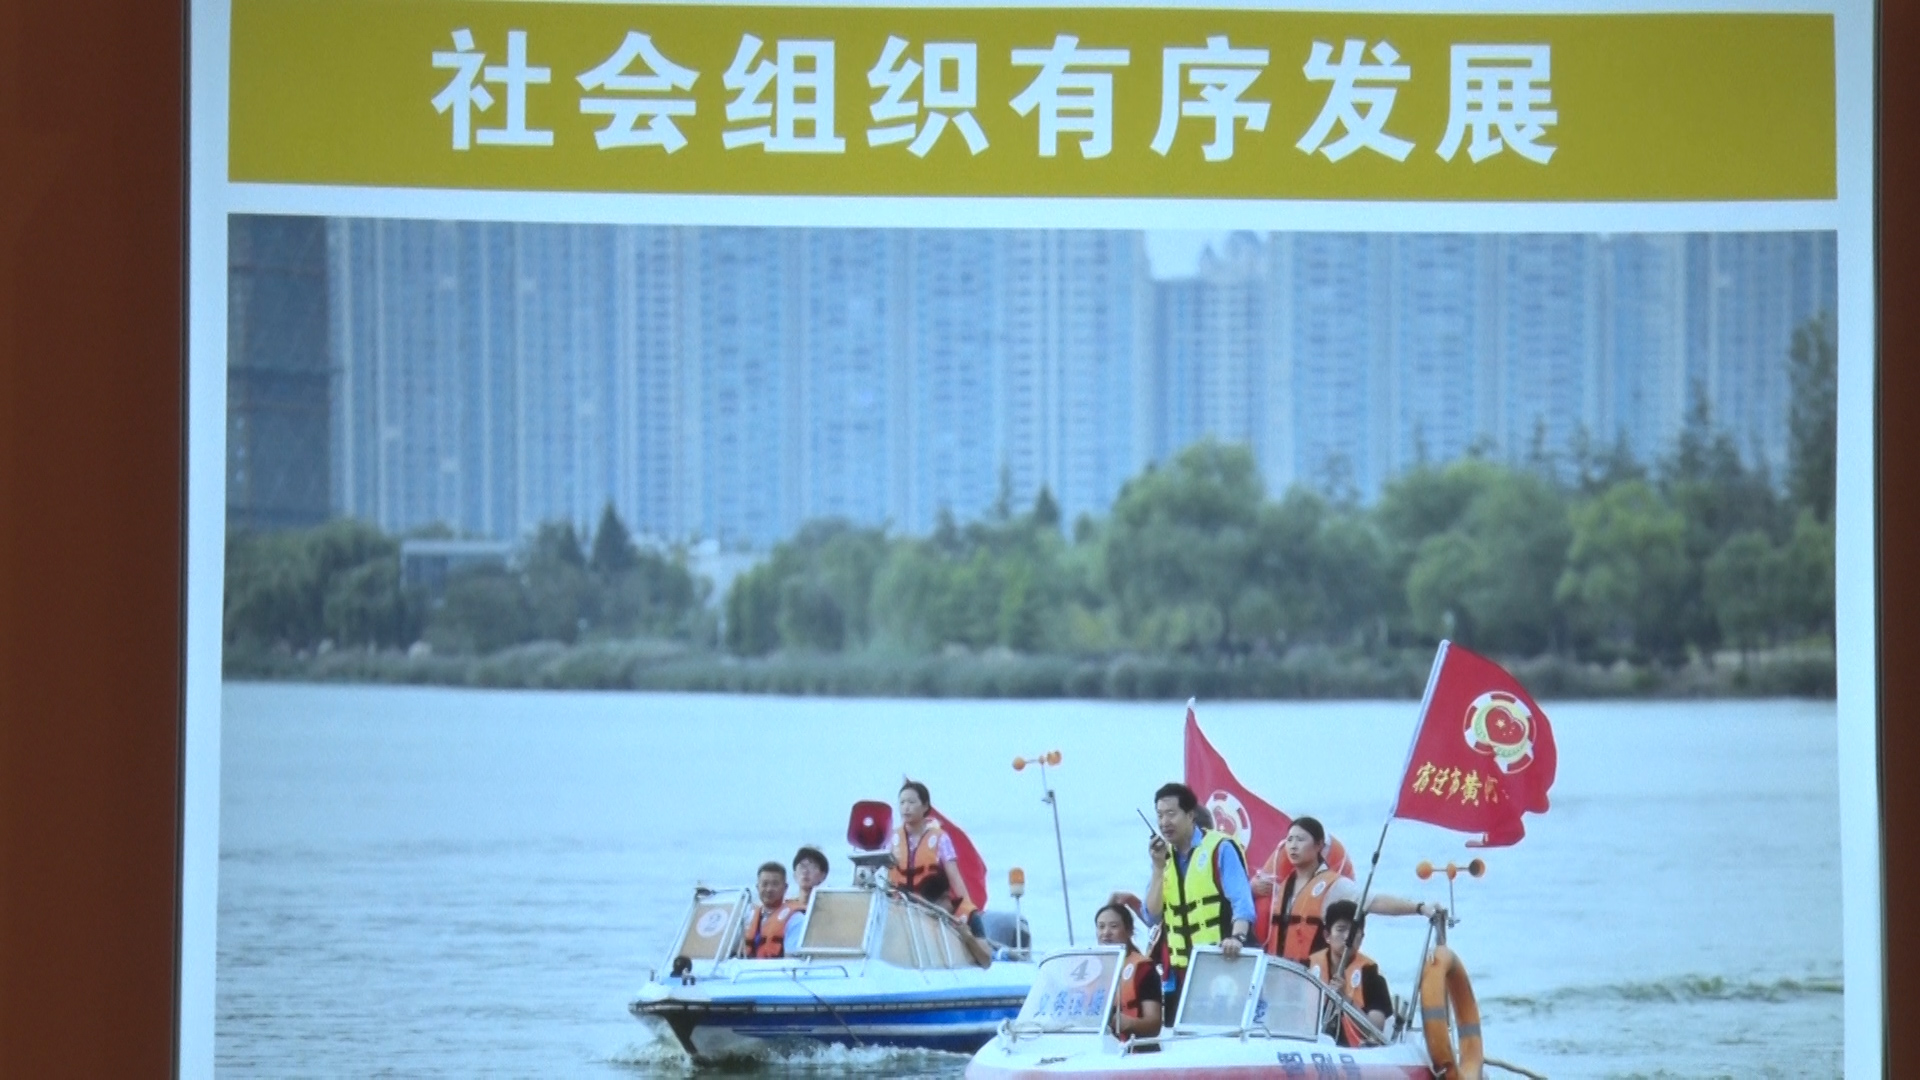 http://www.nthuaimage.com/wenhuayichan/28697.html